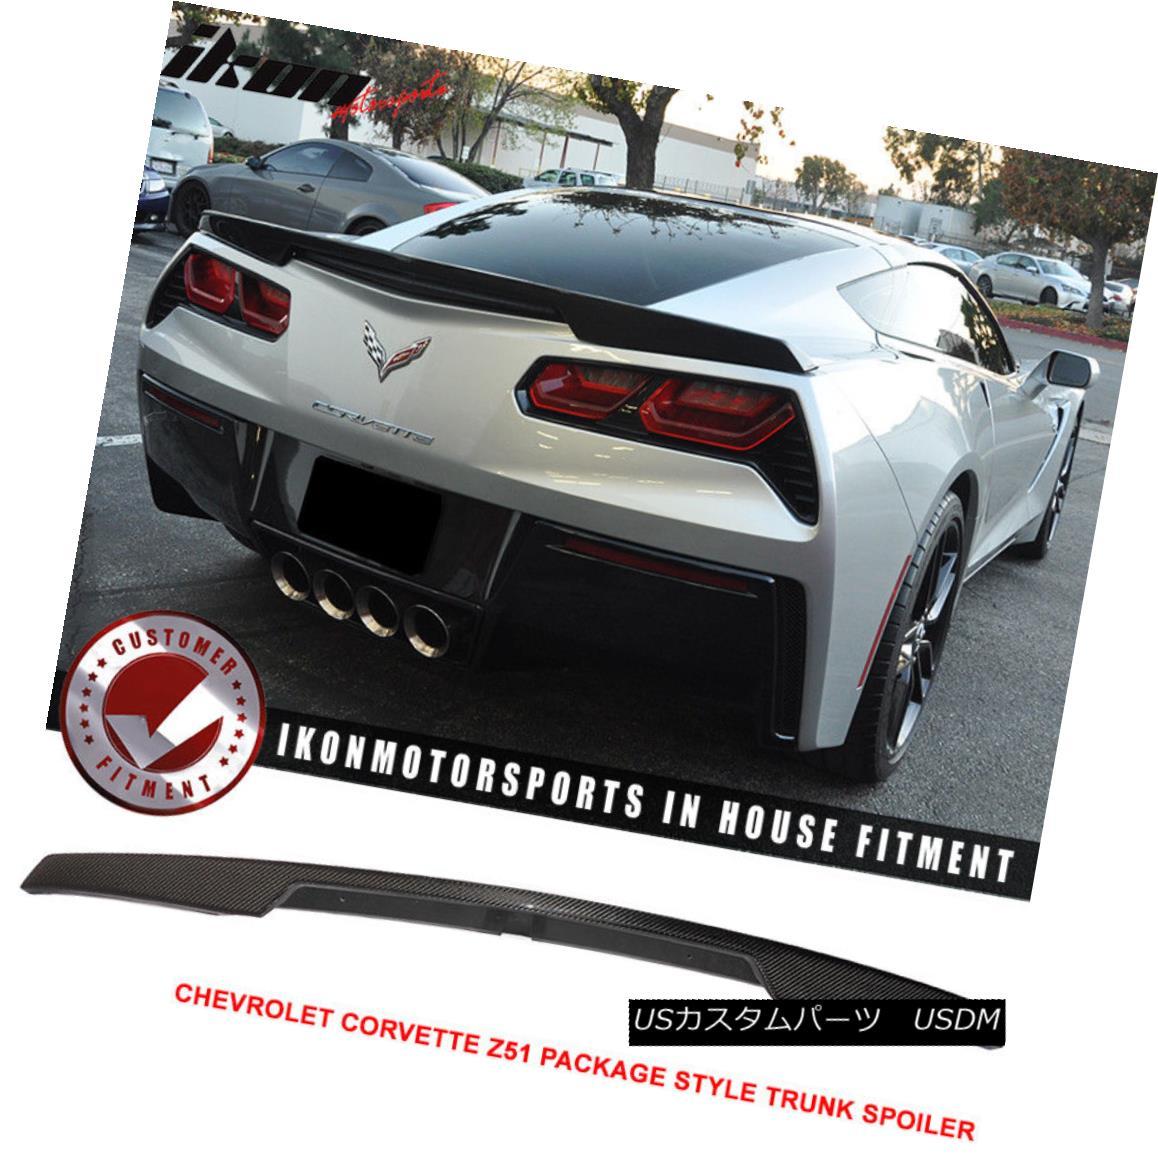 Trunk - Package エアロパーツ Carbon 14-18 C7 Corvette 14-18シボレーコルベットC7 - Z51パッケージスタイルトランクスポイラー カーボンファイバー Fiber Z51 Chevy Spoiler Style